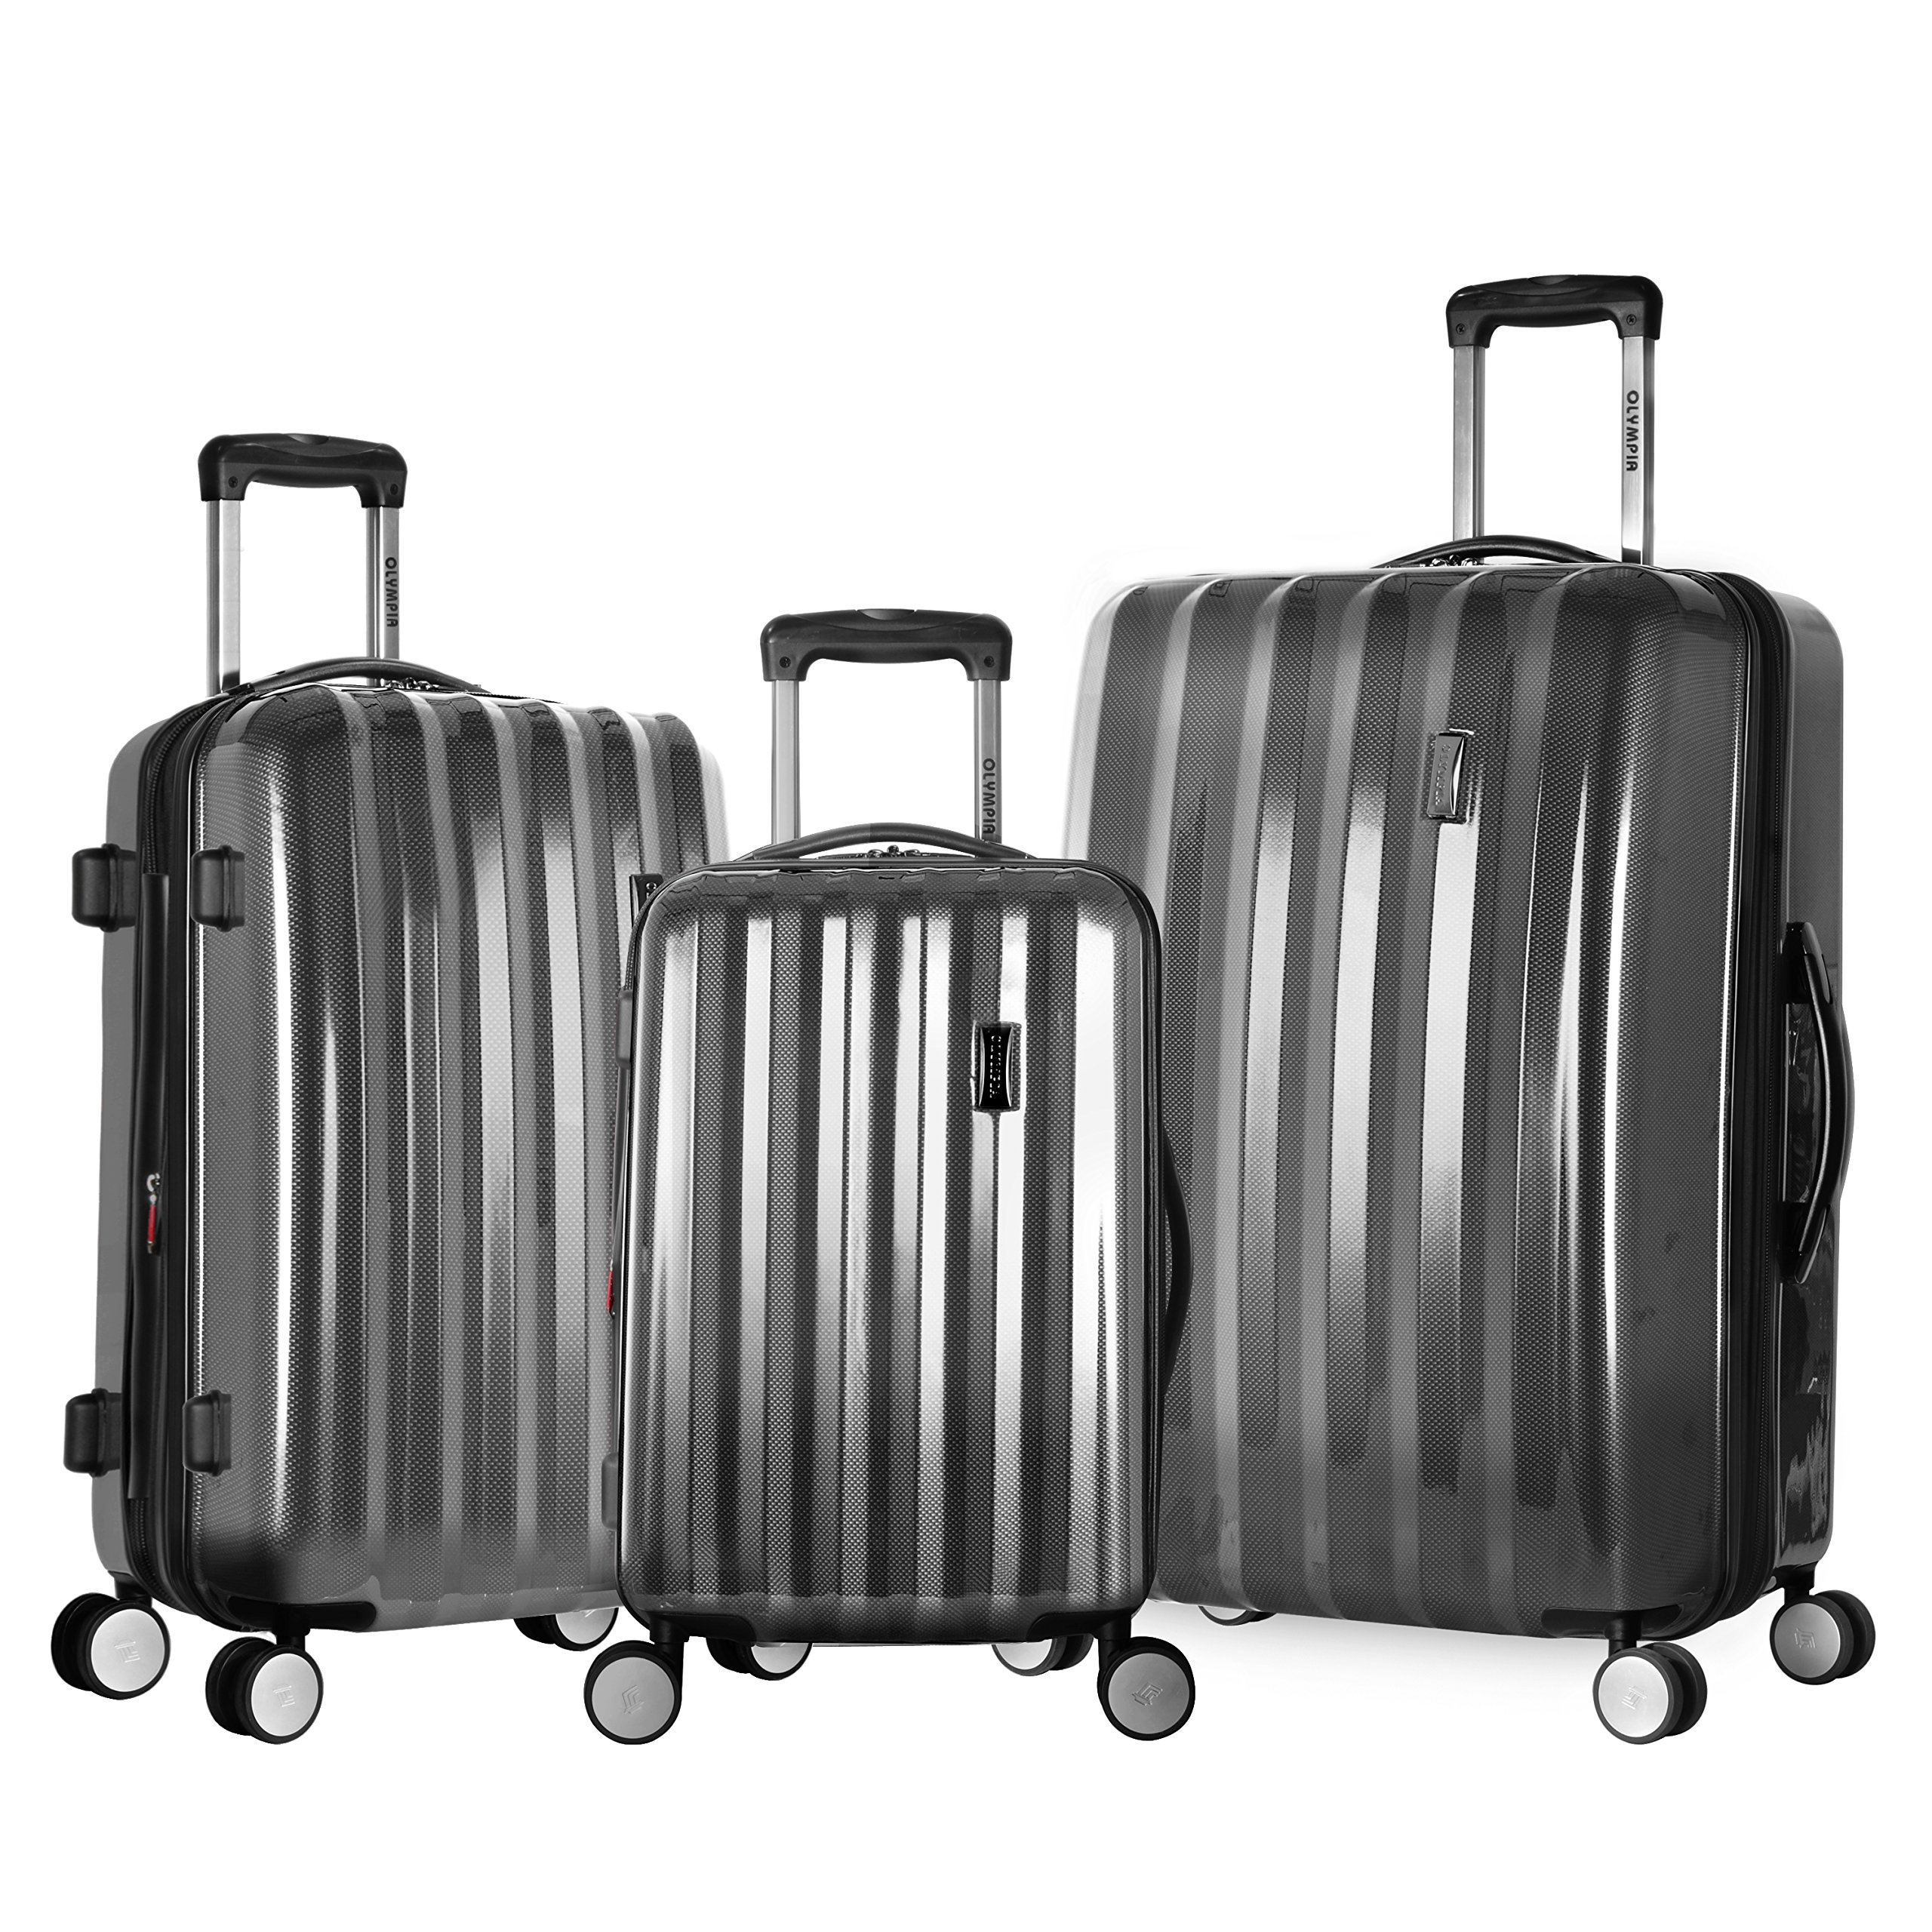 Olympia Luggage Titan 3 Piece Spinner Hardside Set, Black, One Size